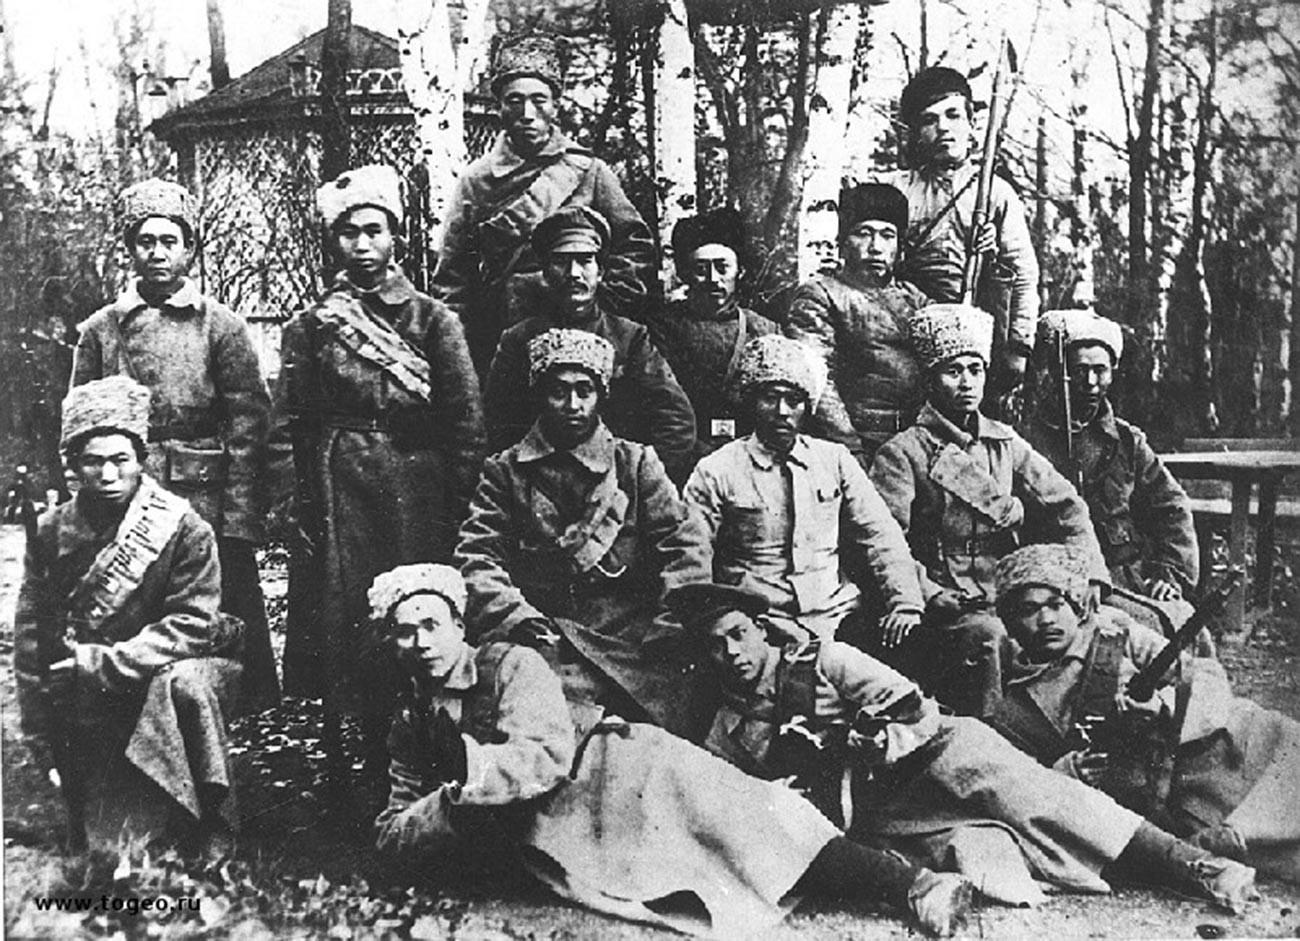 Ren Fuchen (center, white coat) with his soldiers.